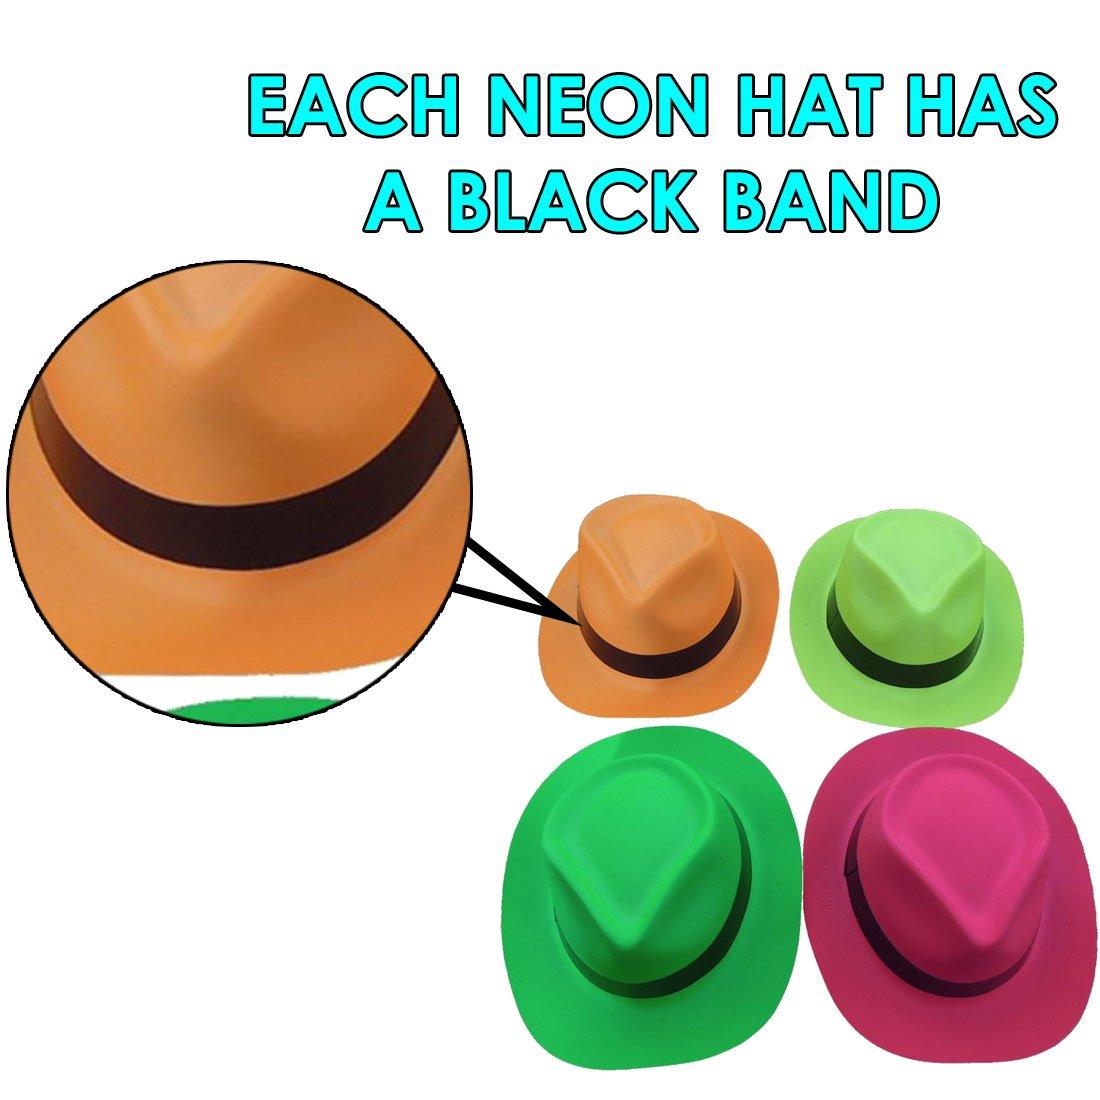 5a4da660658 Neon Plastic Gangster Hats - 24 Pack - Dress Up Toy